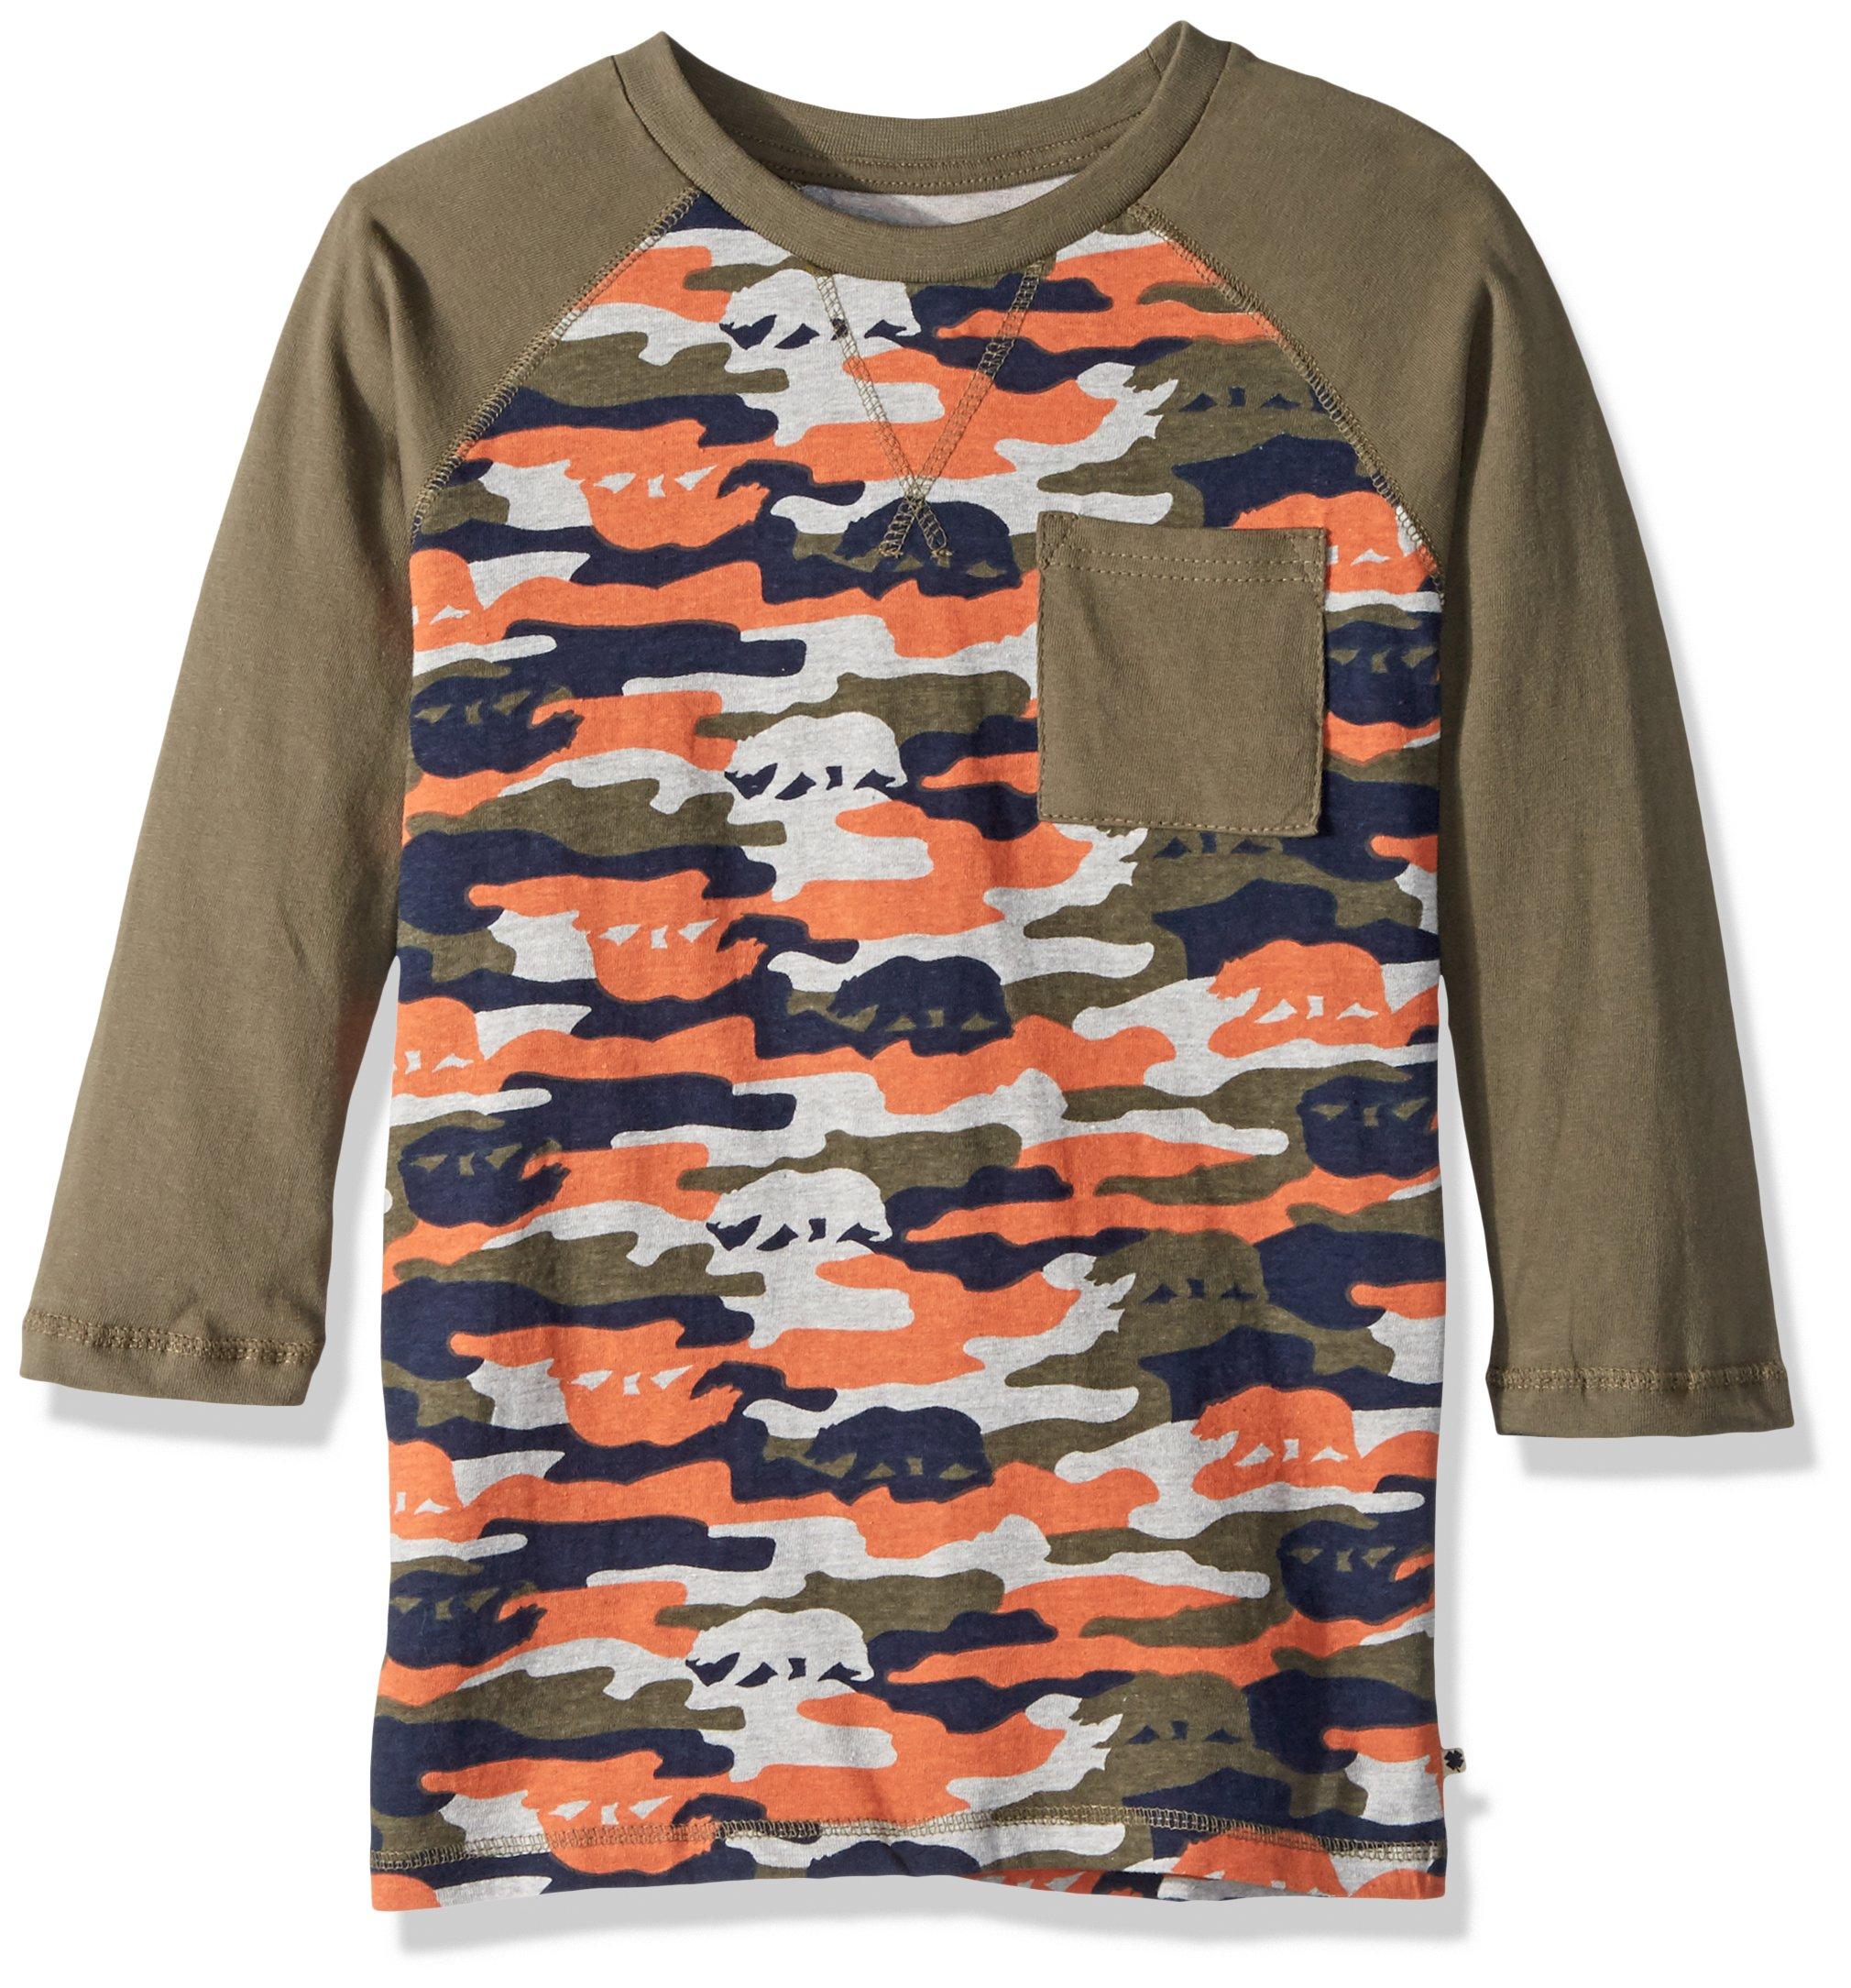 Lucky Brand Toddler' Boys' Camouflage Tee Shirt, Winter Moss camo, 2T